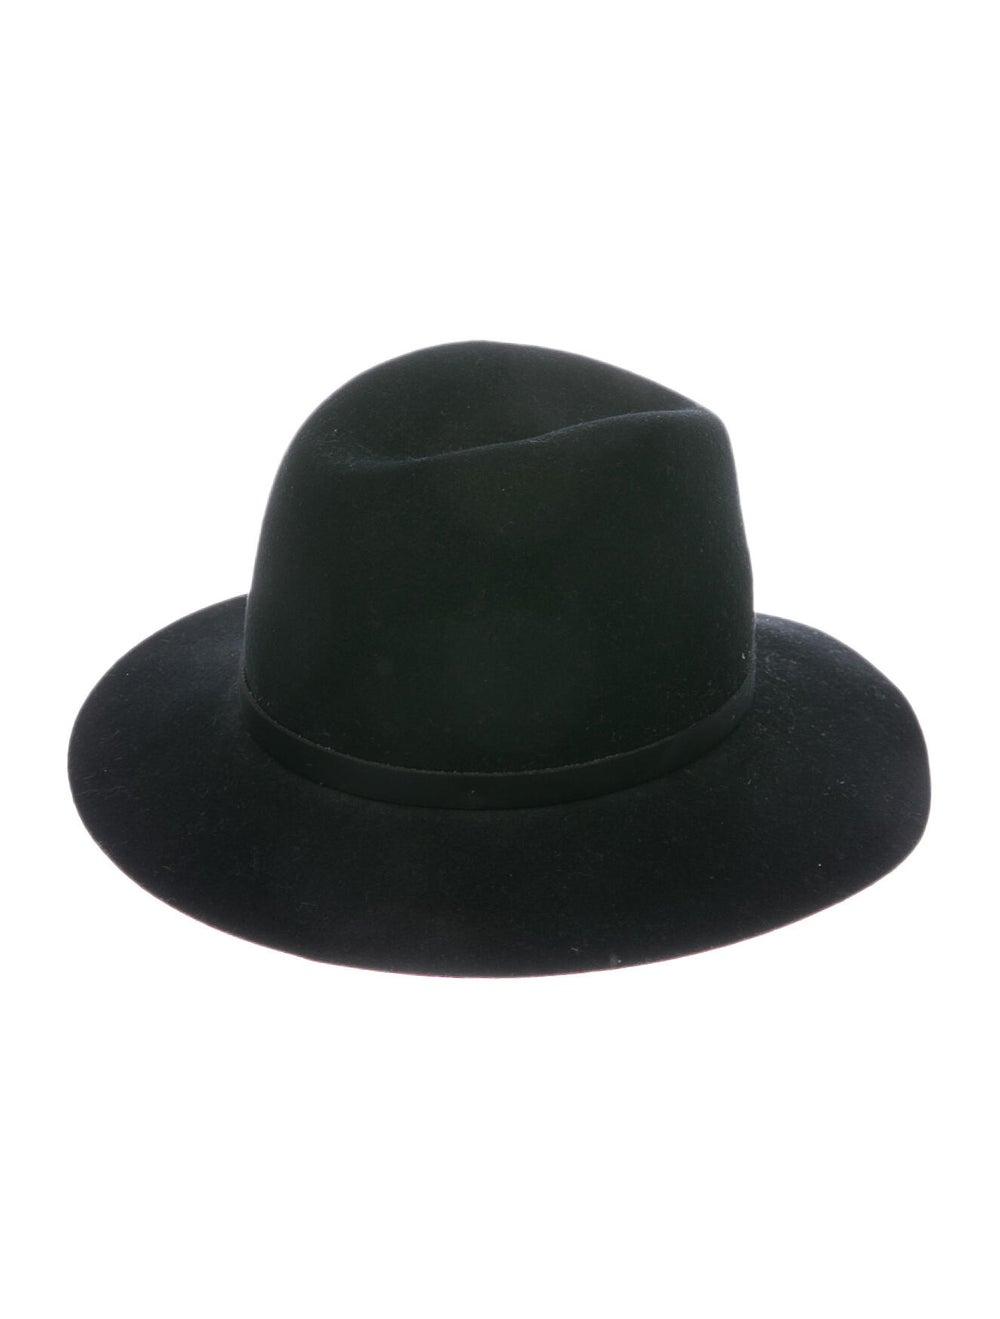 Rag & Bone Wool Fedora Hat Black - image 2